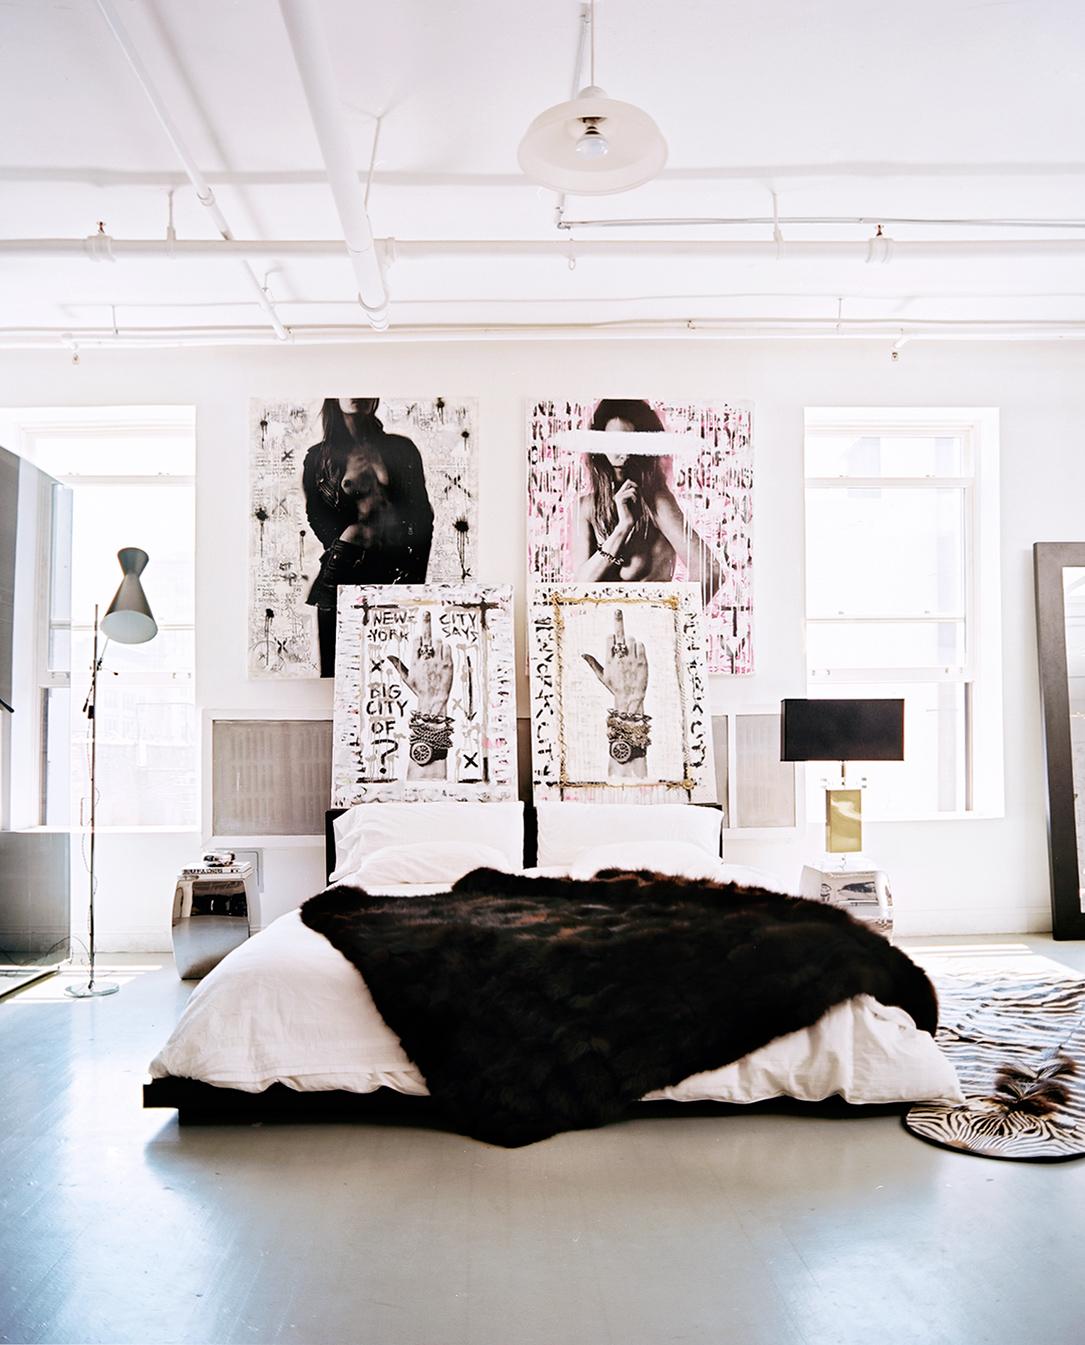 New York Lofts: Artistic New York Loft